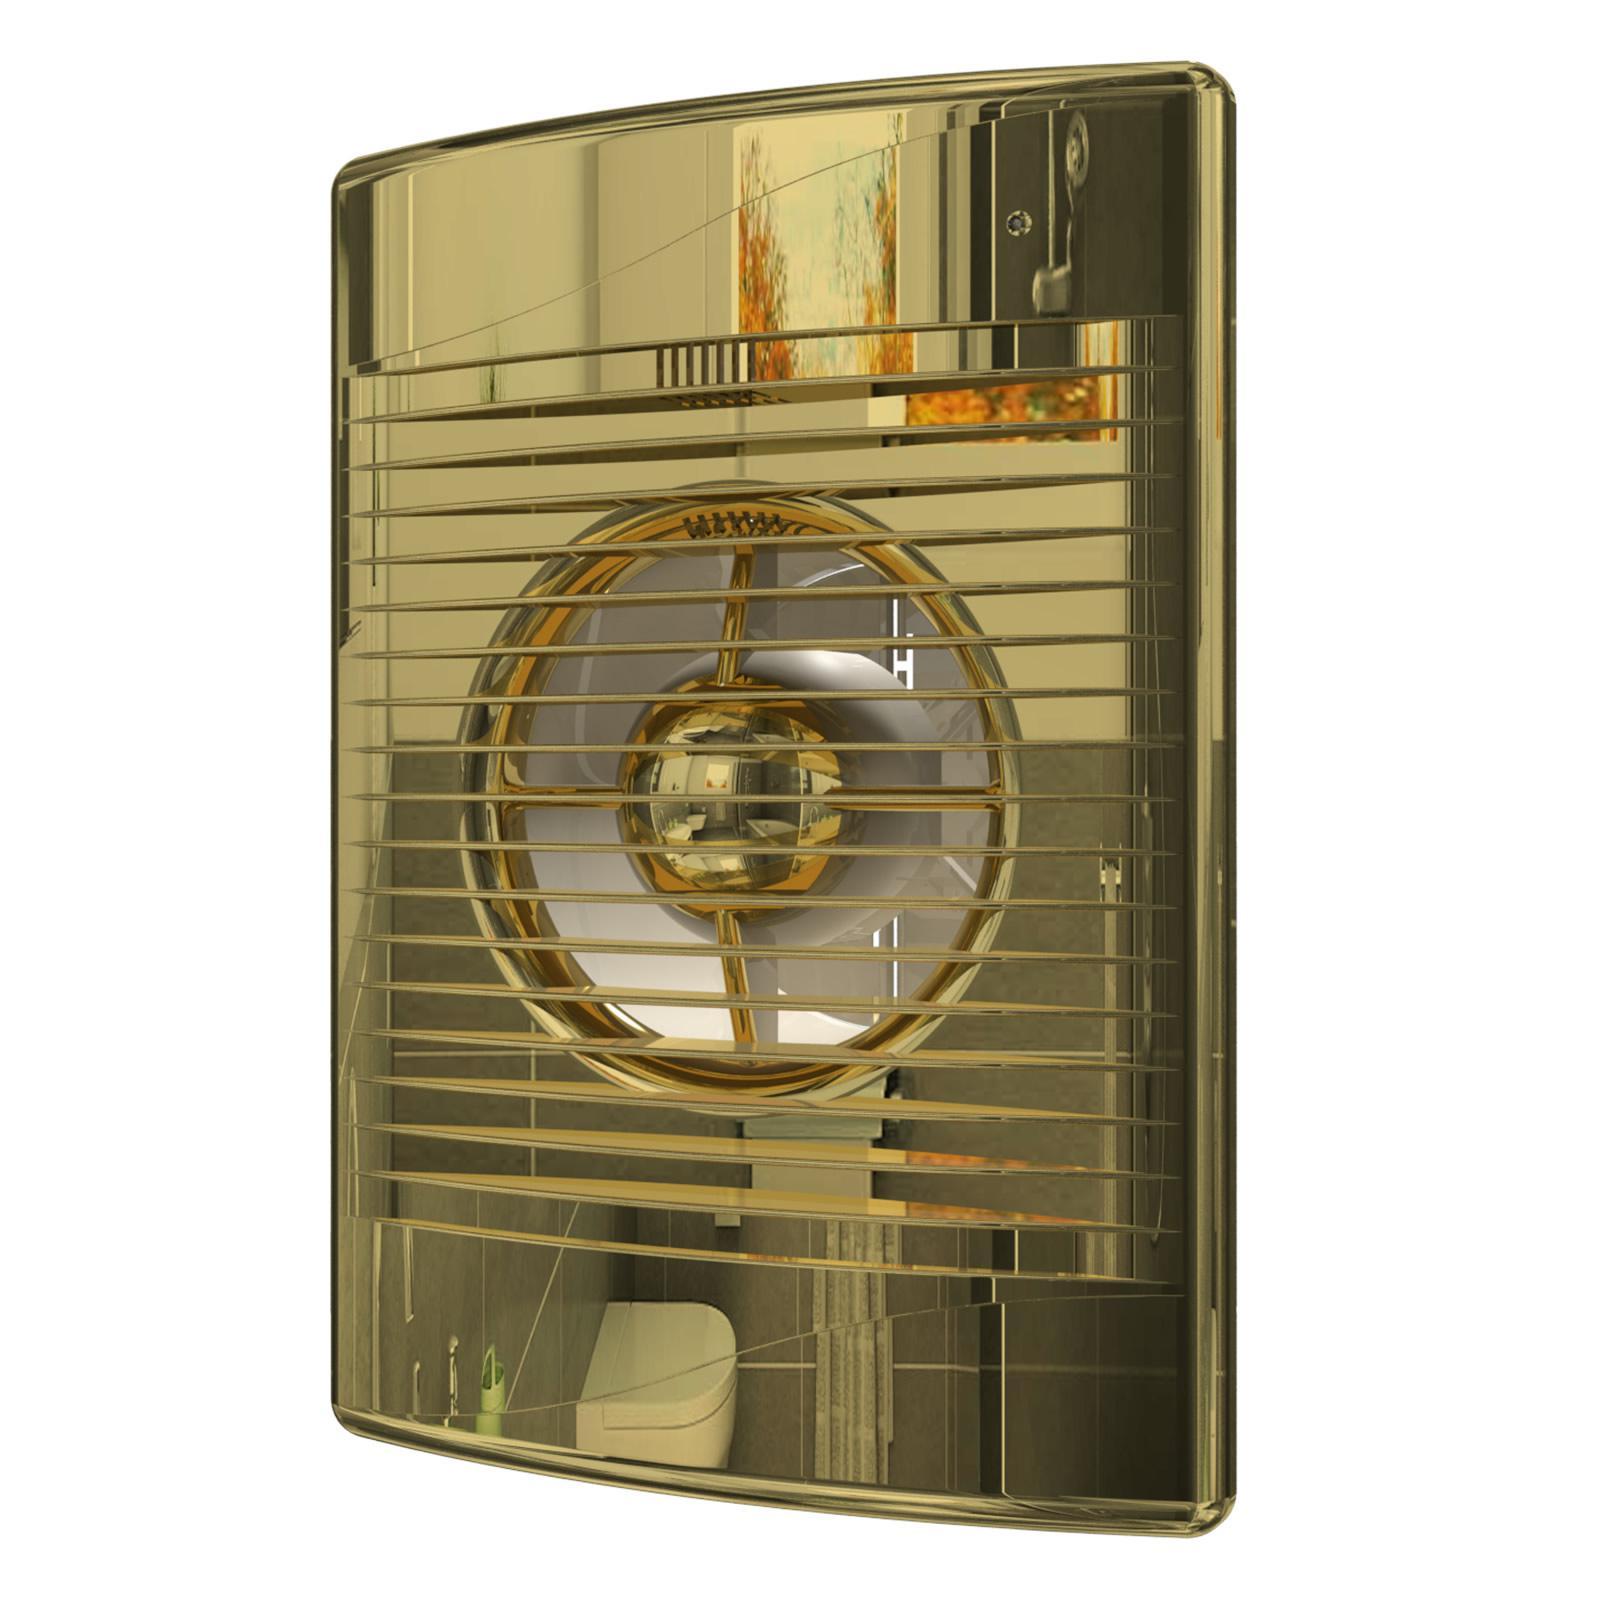 Вентилятор Diciti Standard 5c gold